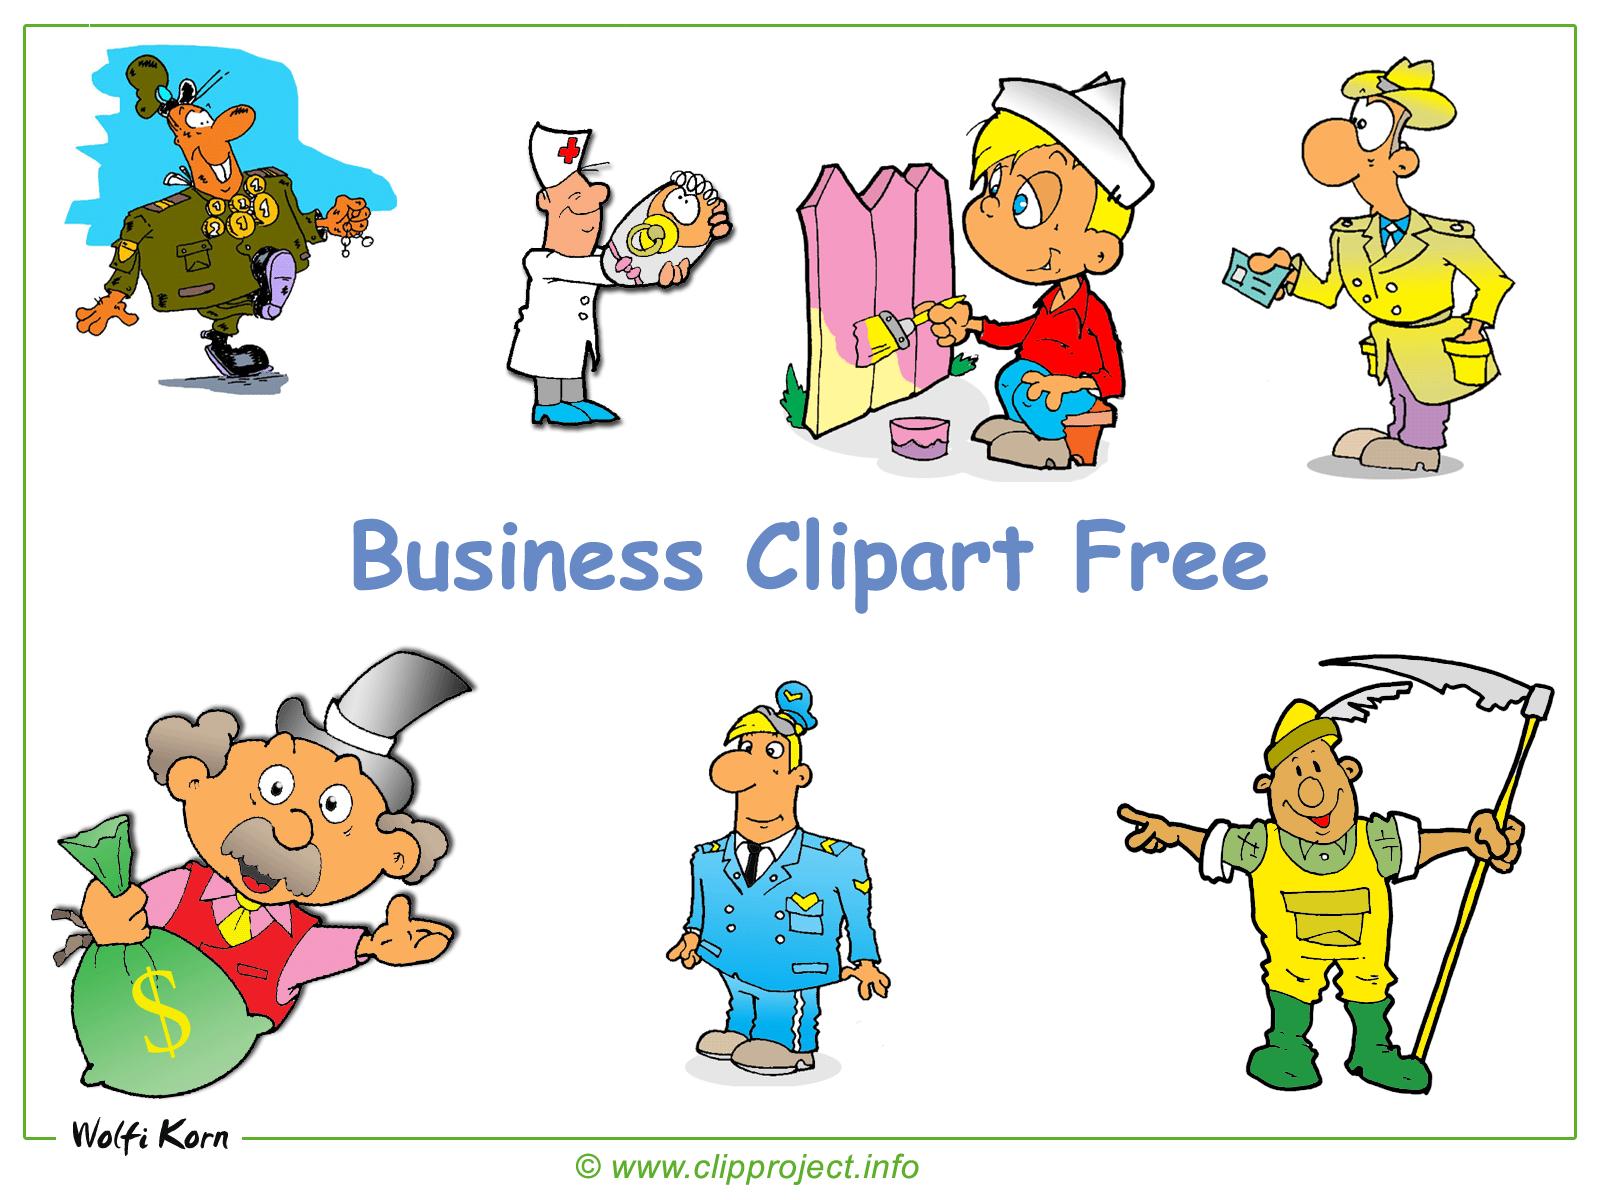 Clip art download free clipart Free download clipart - ClipartFest clipart